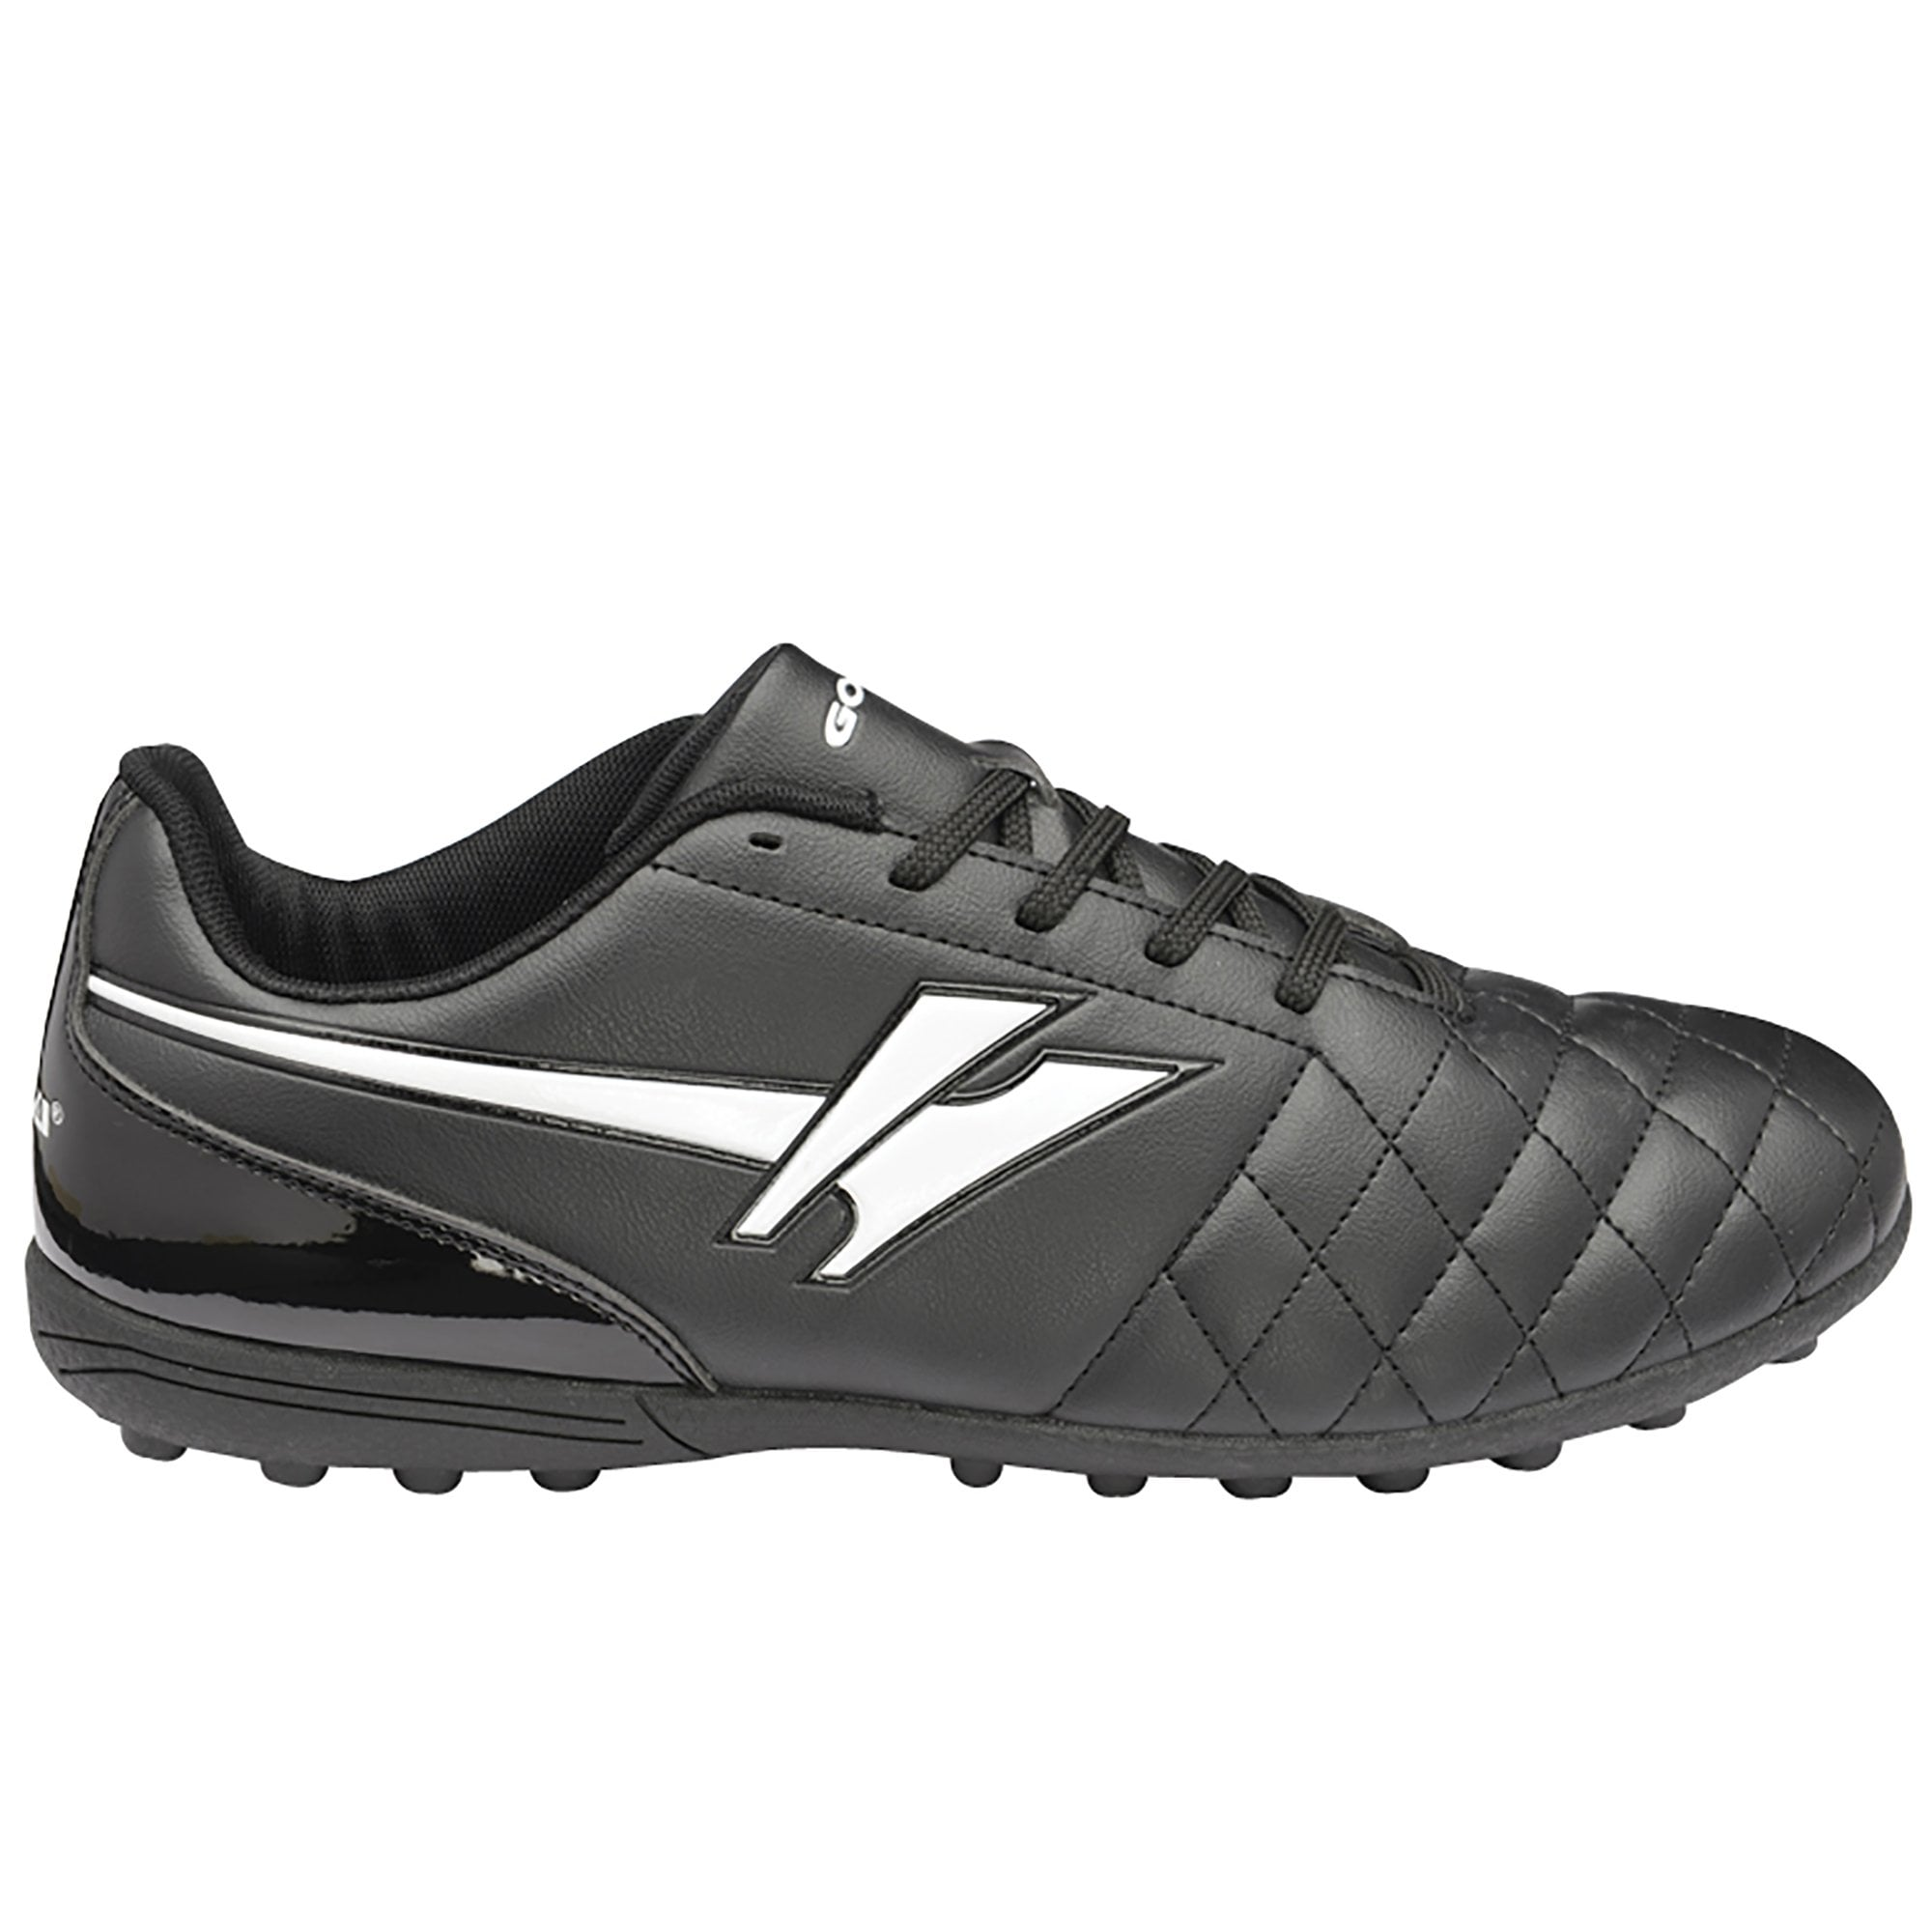 Rey VX astro turf boots in black